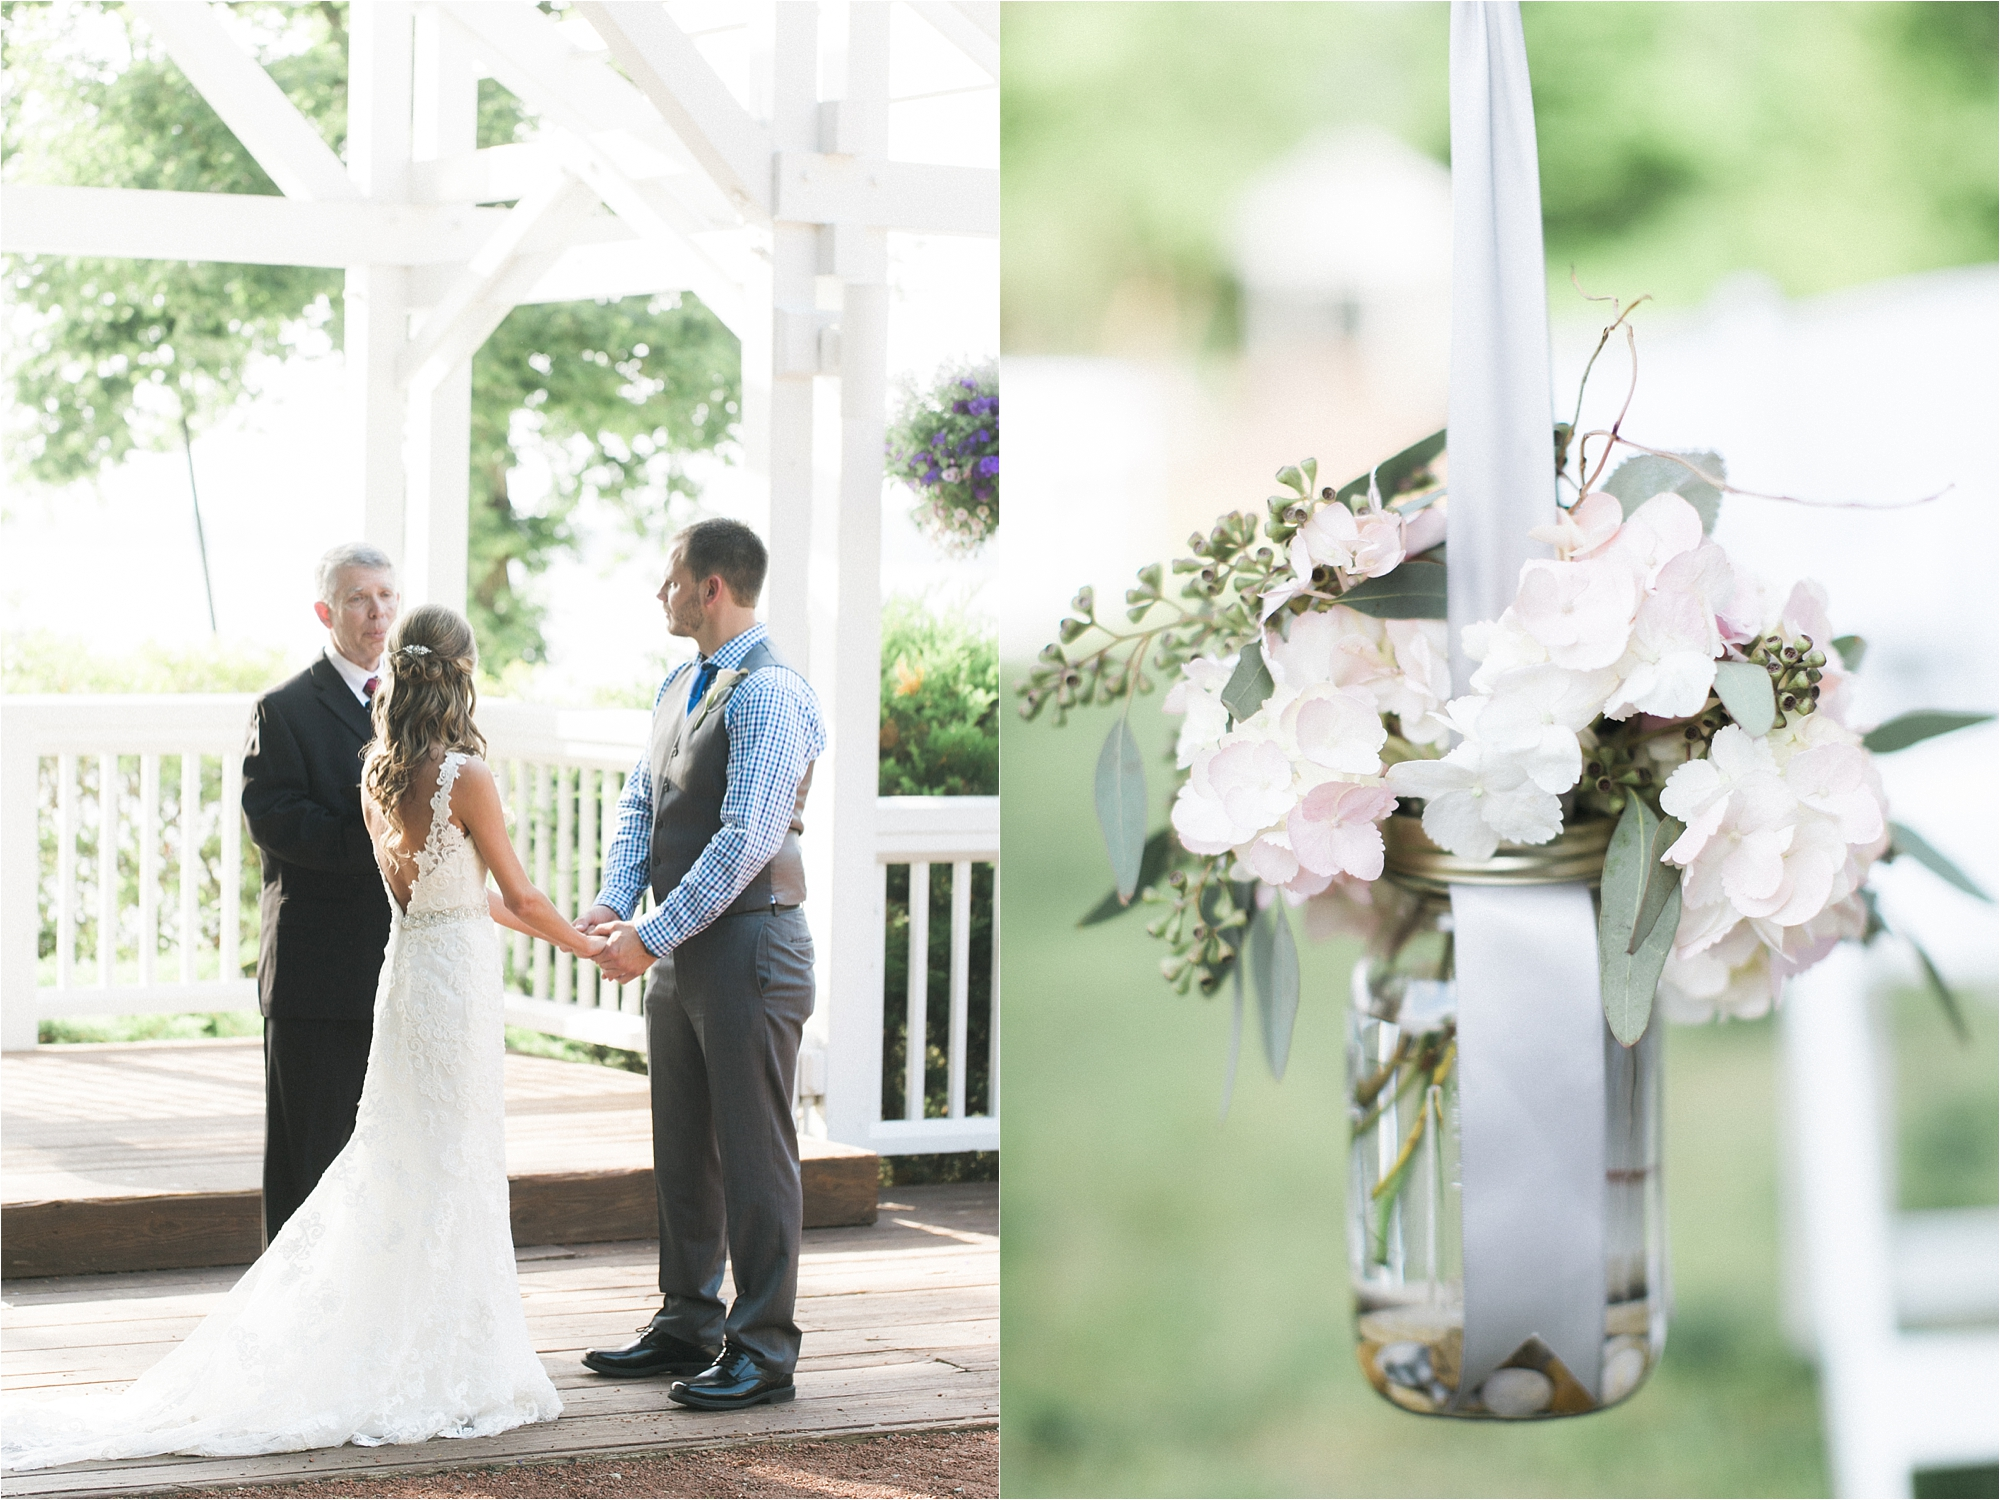 stephanie-yonce-boathouse-sunday-park-virginia-wedding-photo-017.JPG